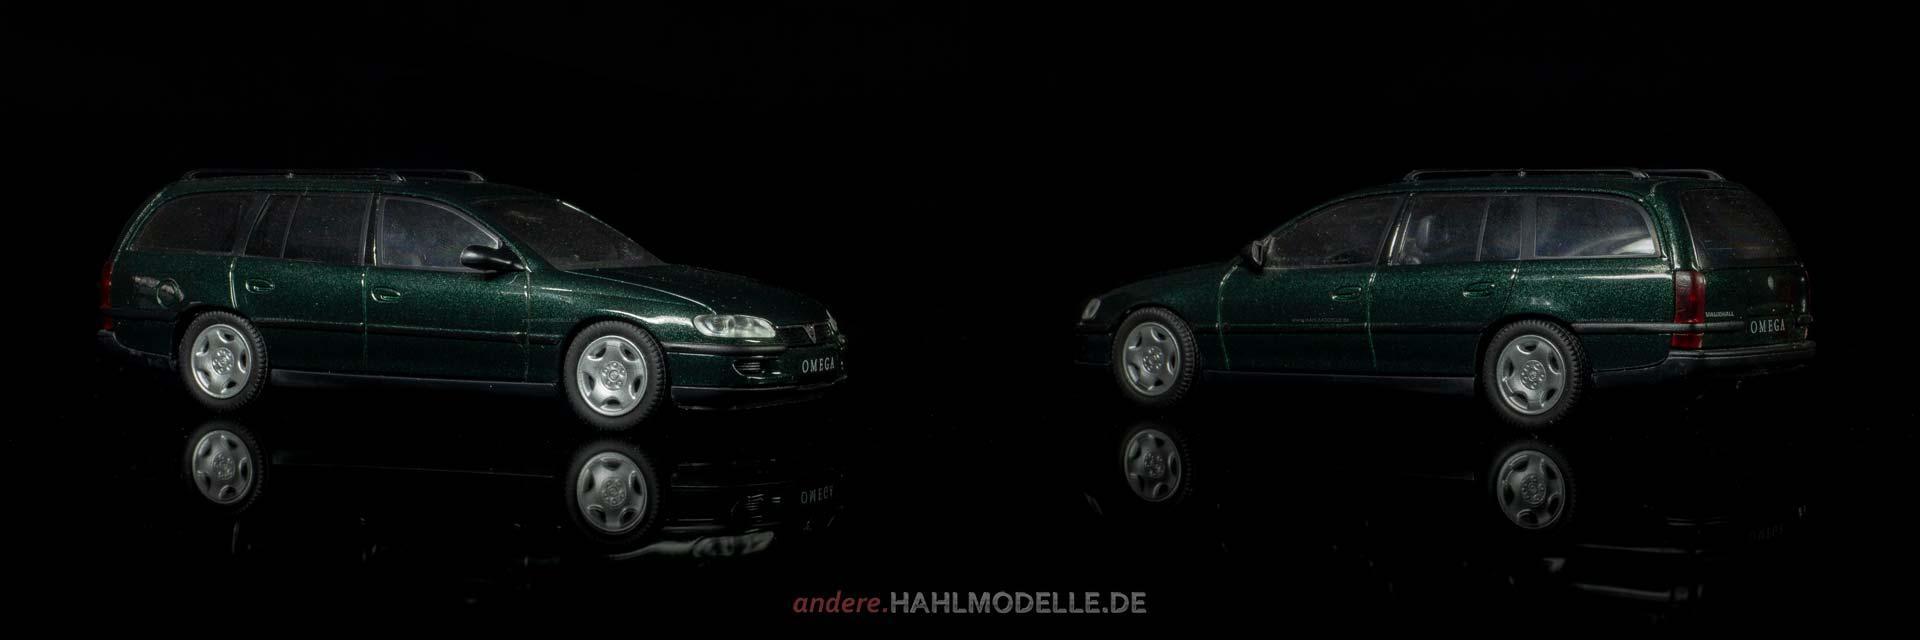 Vauxhall Omega Estate | Kombi | Schuco | 1:43 | www.andere.hahlmodelle.de